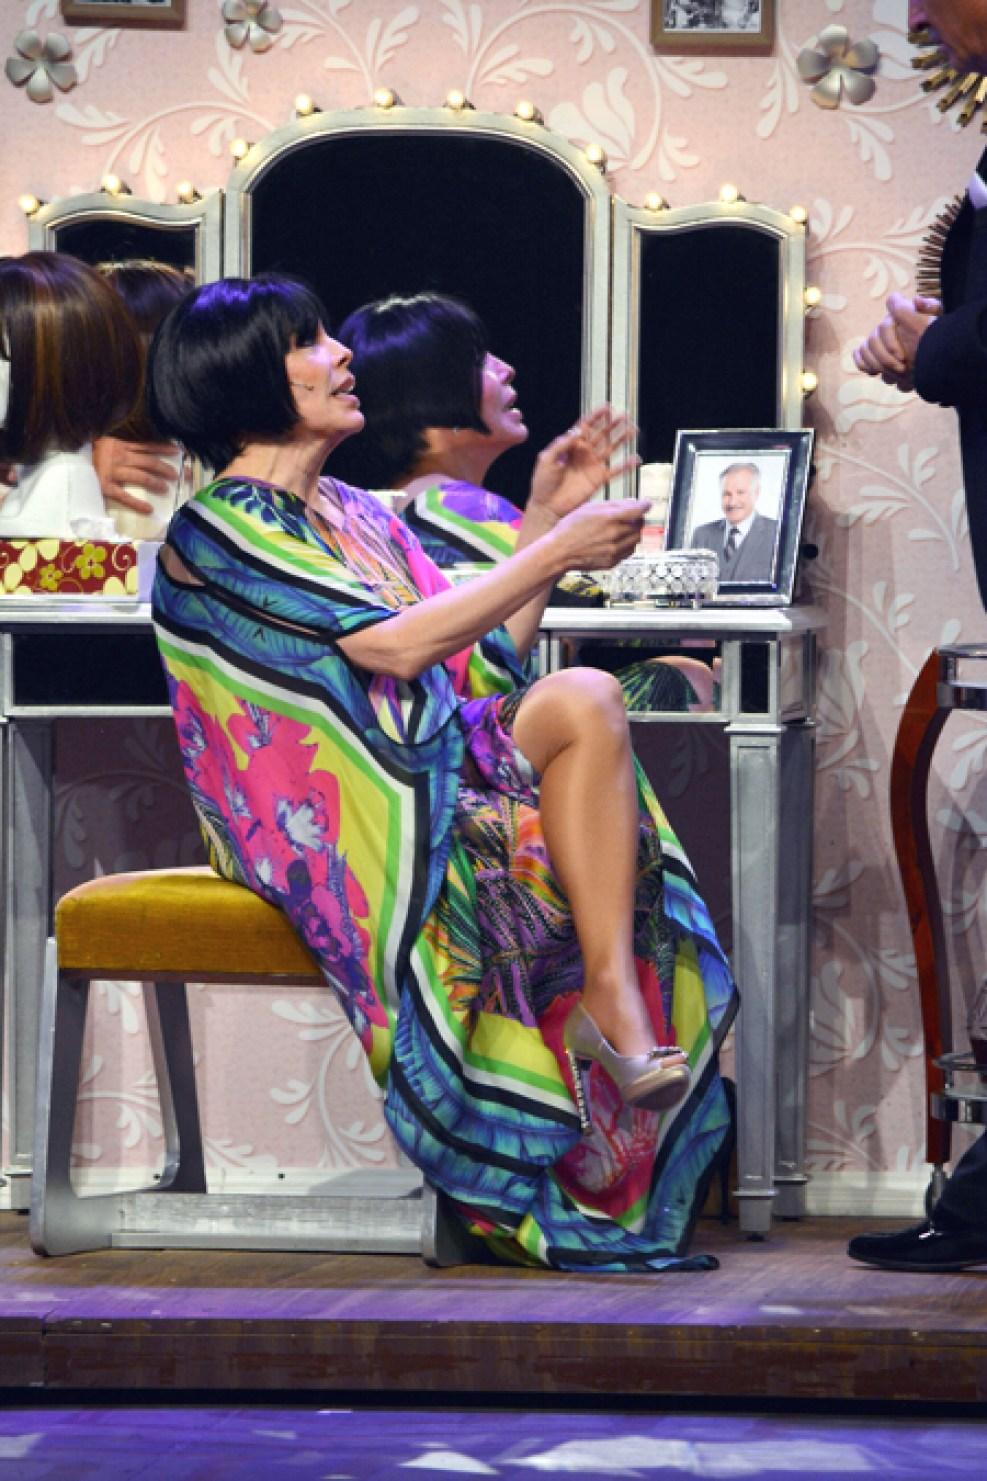 http://media.telemundo51.com/images/987*1481/veronica-castro-teatro-aplauso-11.jpg